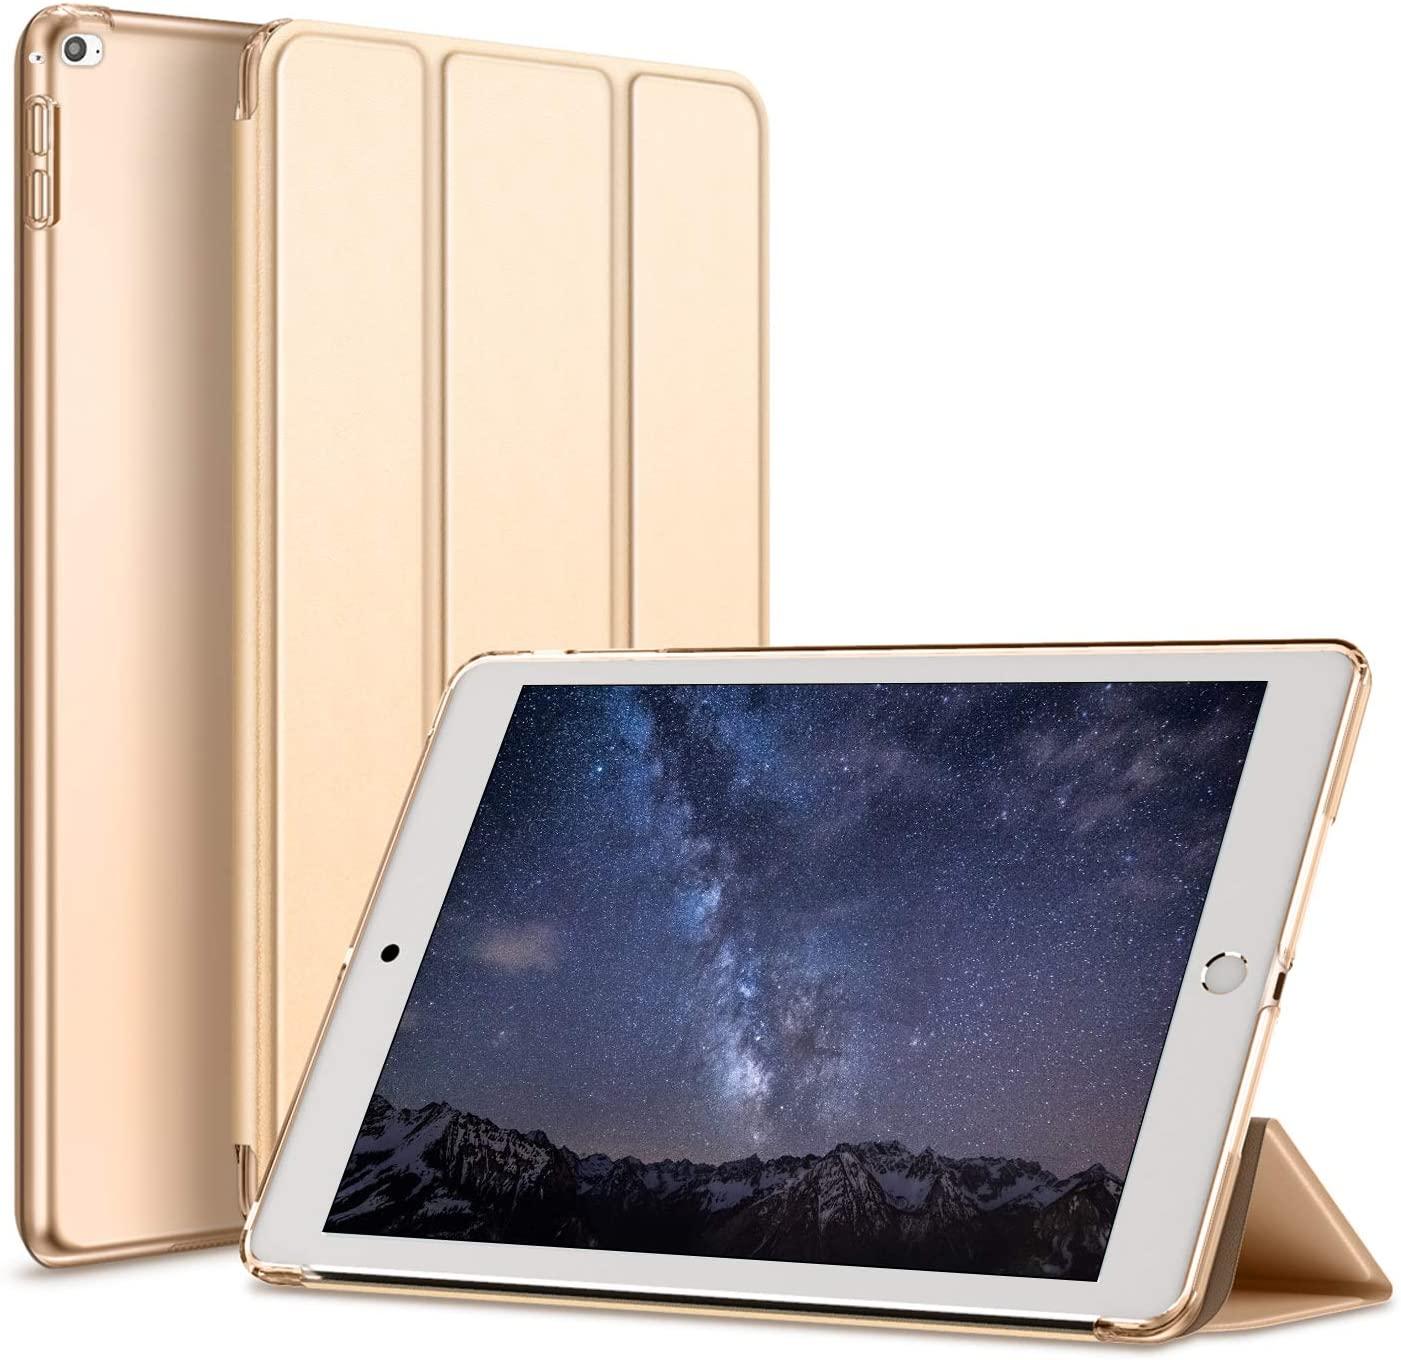 Kenke iPad Mini 4 case 7.9 inch Slim Lightweight Smart iPad Cover 7.9 Inch,Transparent Hard Shell with Auto Sleep Wake for iPad Mini 4th Generation Model A1538/A1550 (Gold)